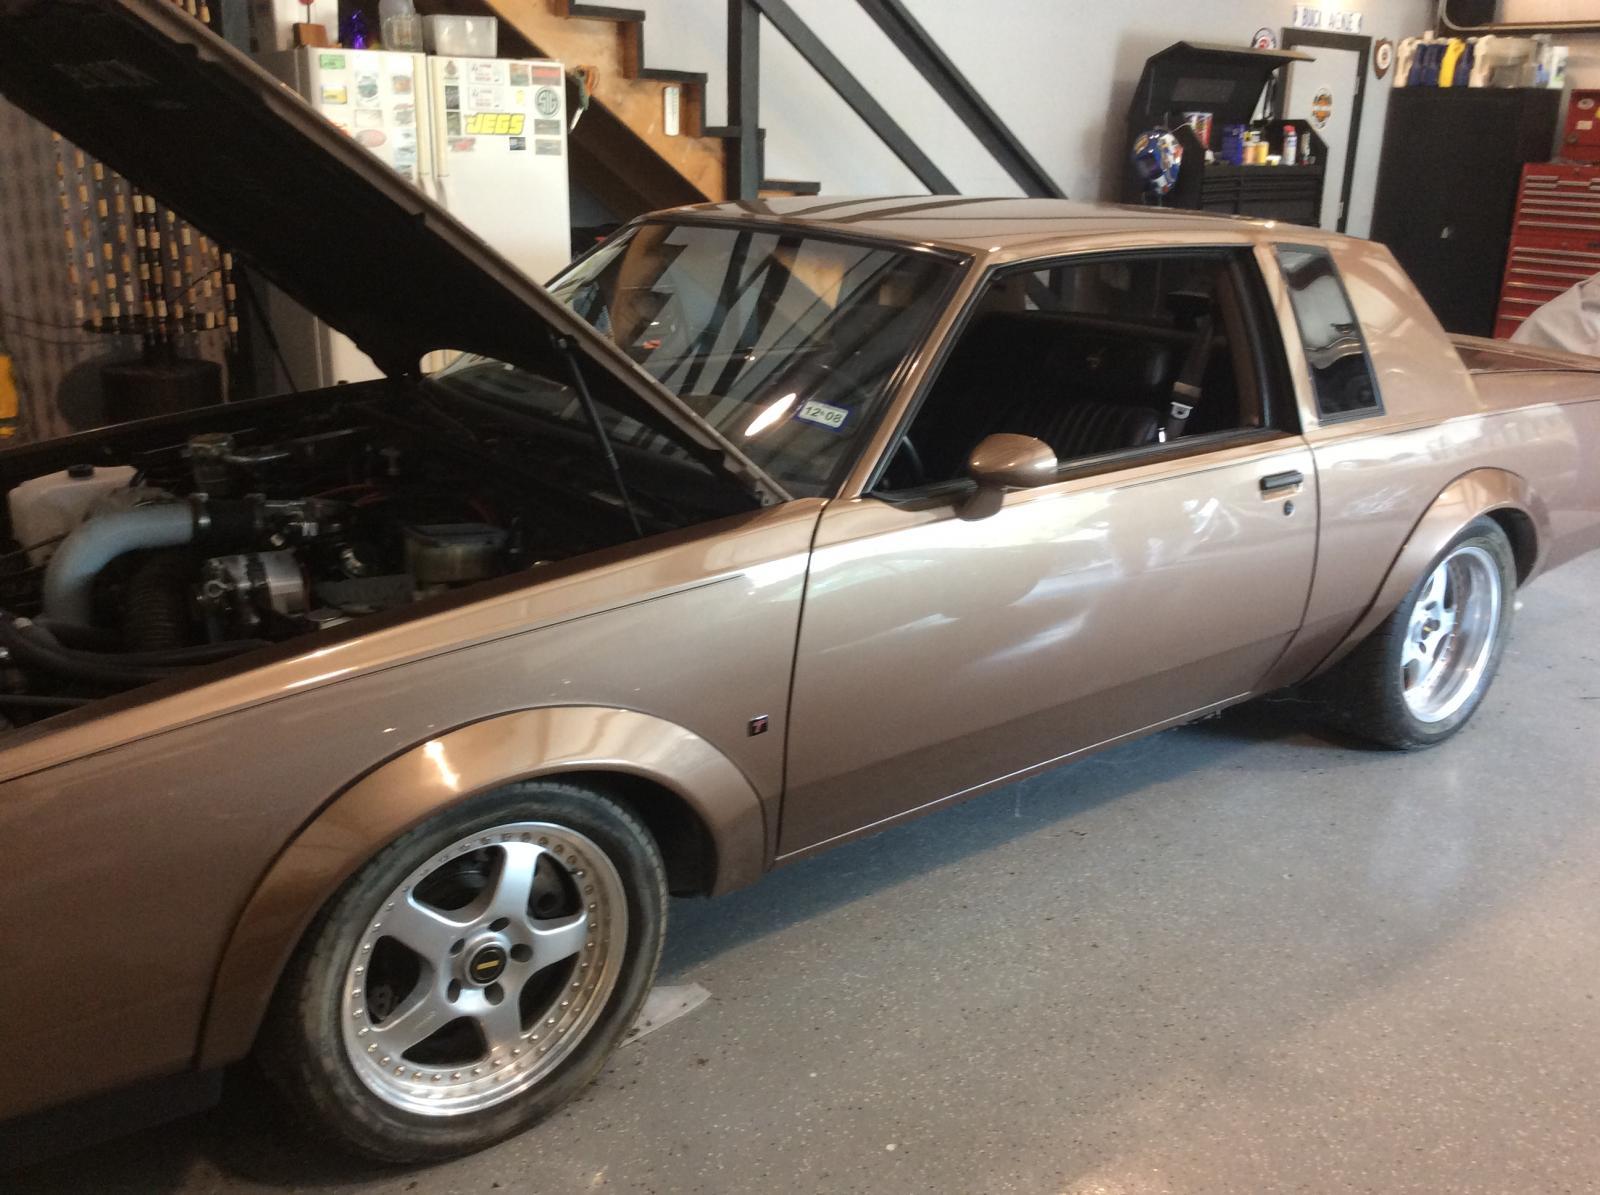 87 Turbo T for sale in TX-389aa664-6666-4d58-ab1e-b07a6e04ef32.jpg